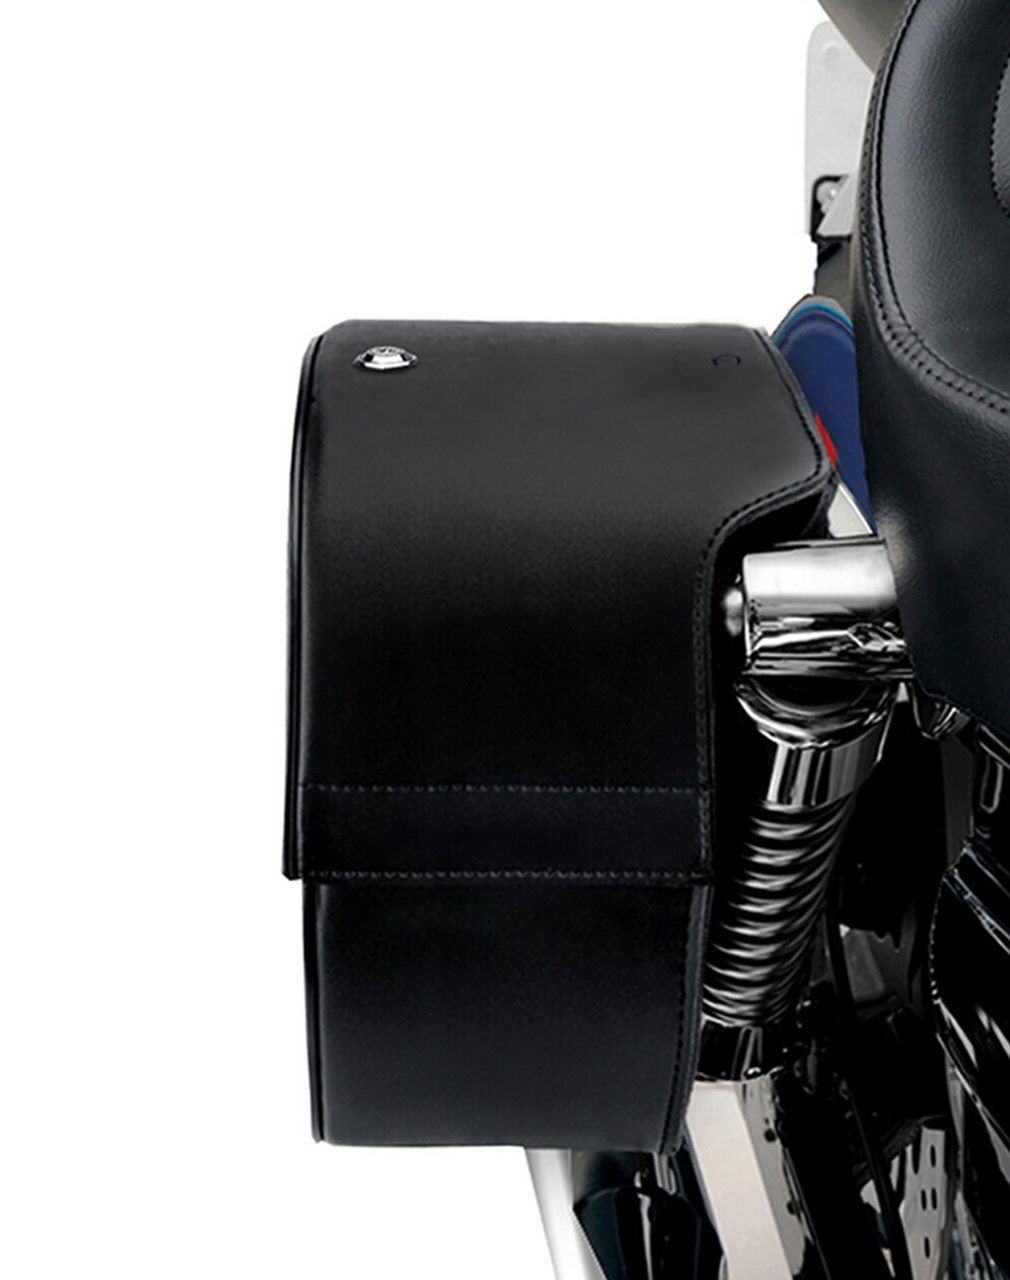 Honda VTX 1800 C Shock Cutout Slanted Large Motorcycle Saddlebags Shock Cutout View